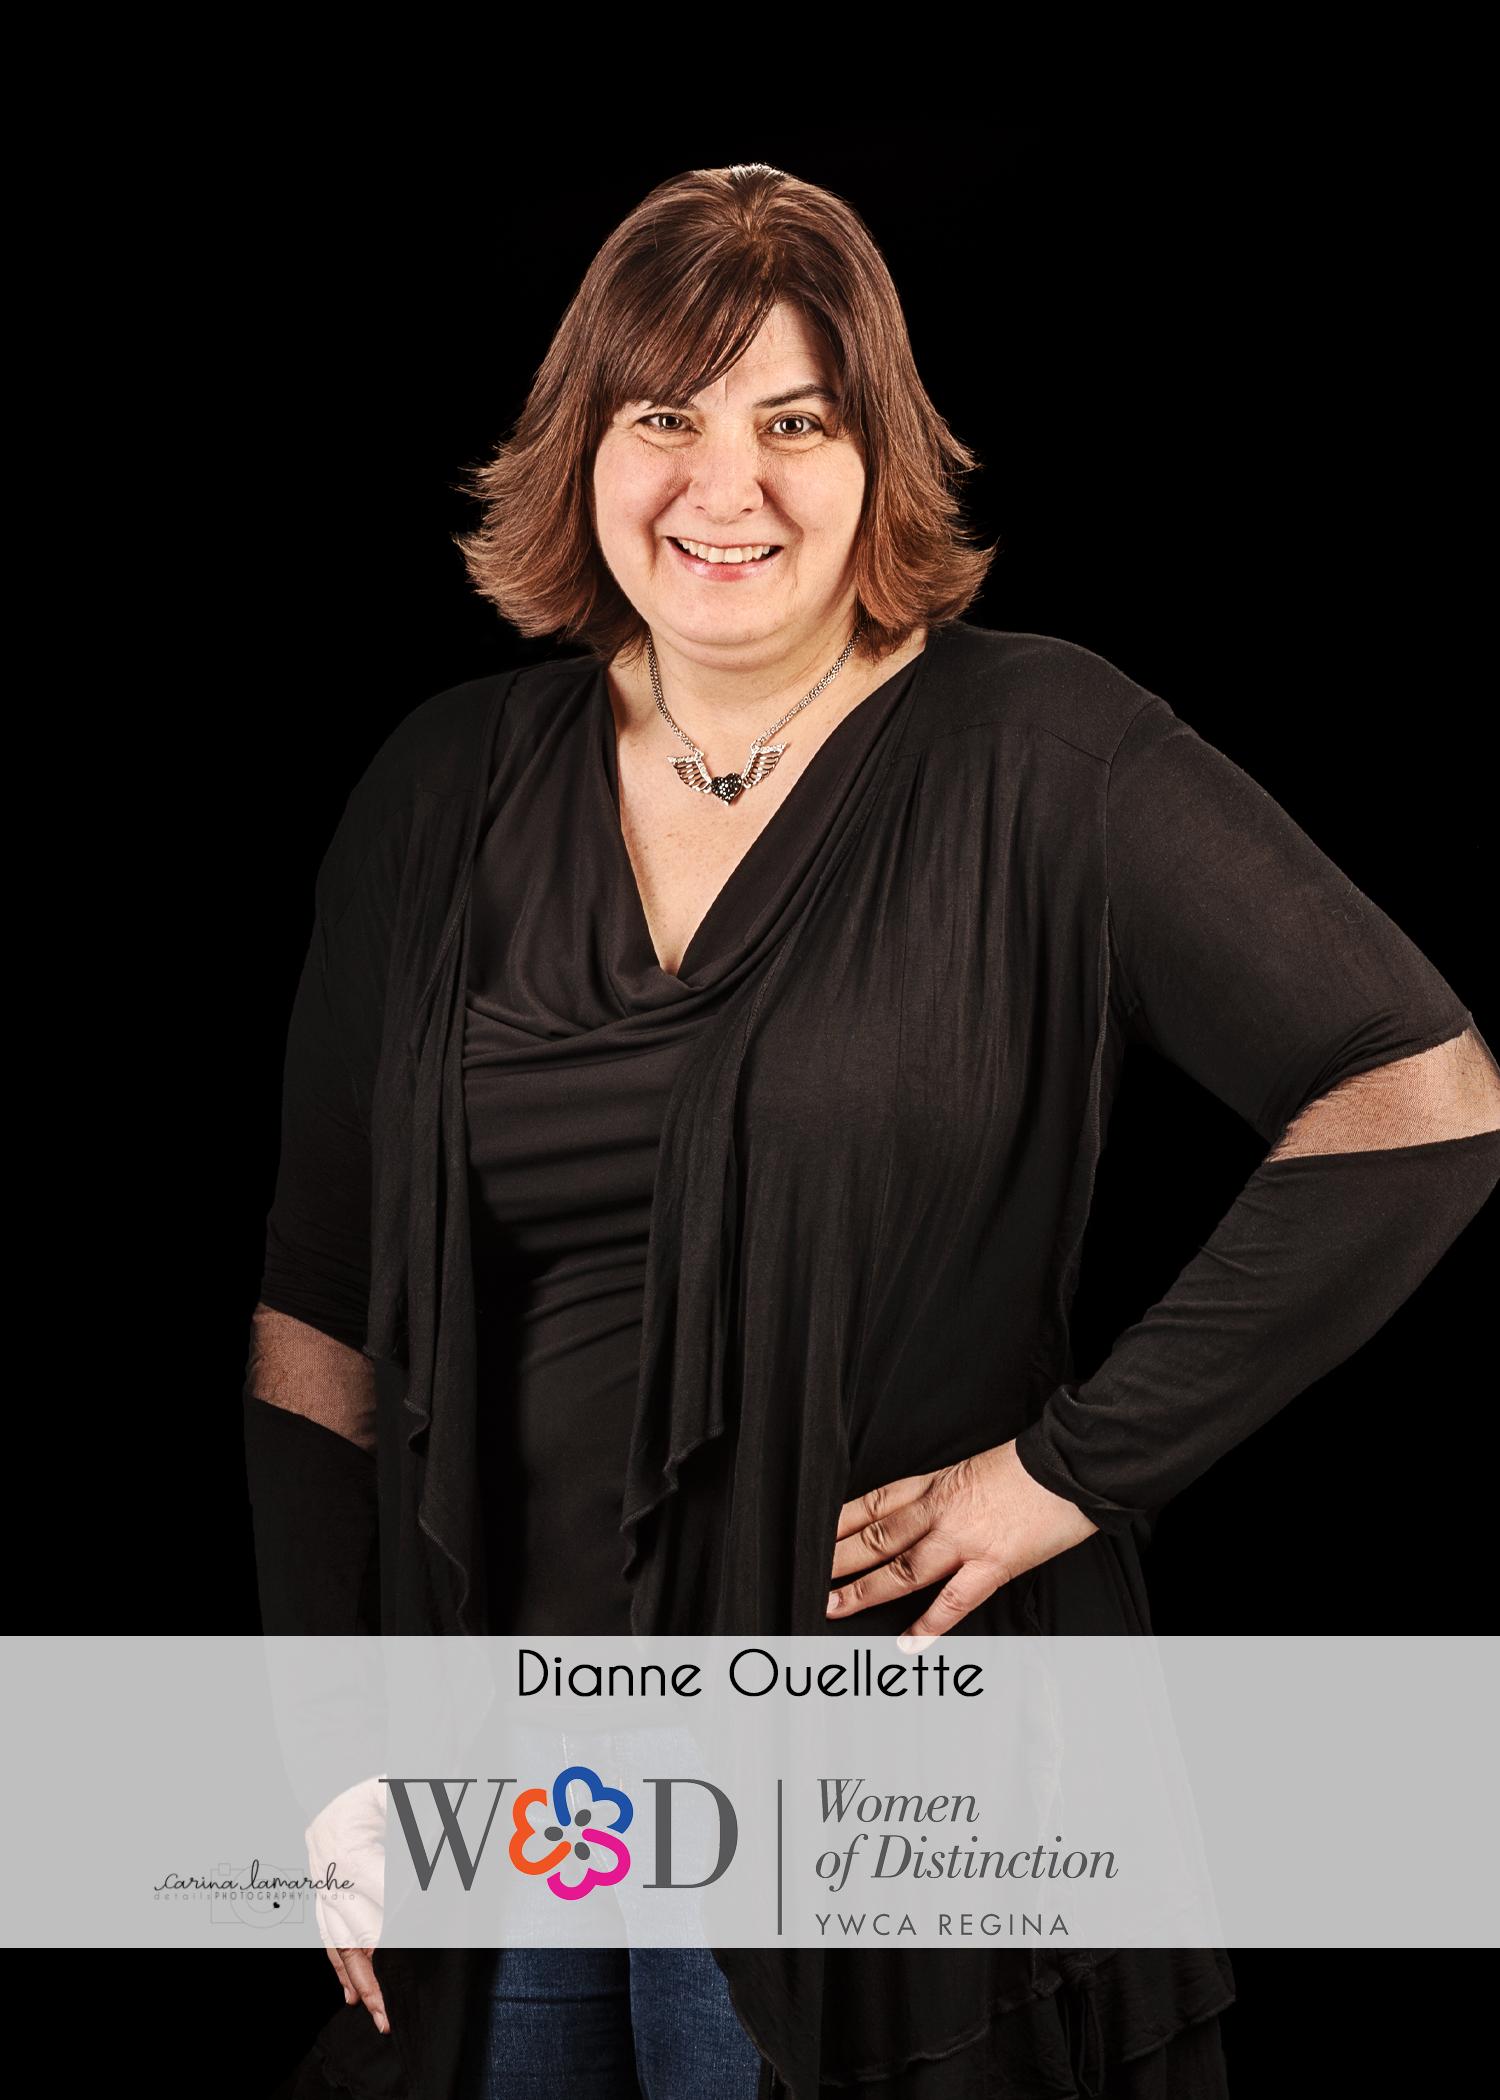 2019_051_Dianne_Ouellette_5x7.1.jpg